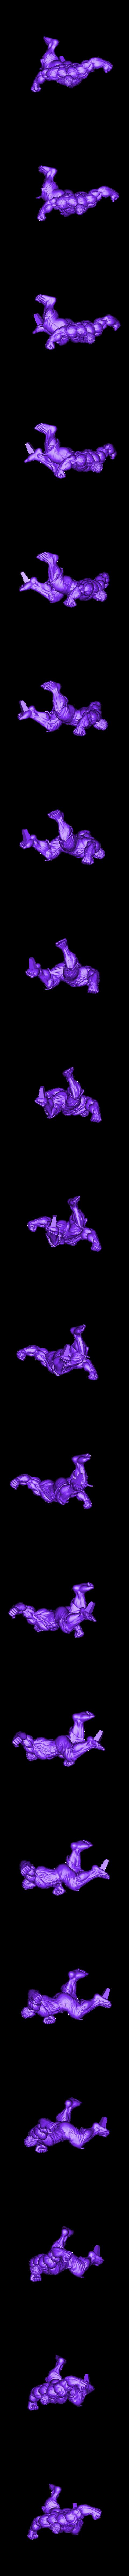 Hulk_Full_225mm.stl Download STL file Hulk Angry - Super Hero - Marvel 3D print model • 3D print model, Bstar3Dart